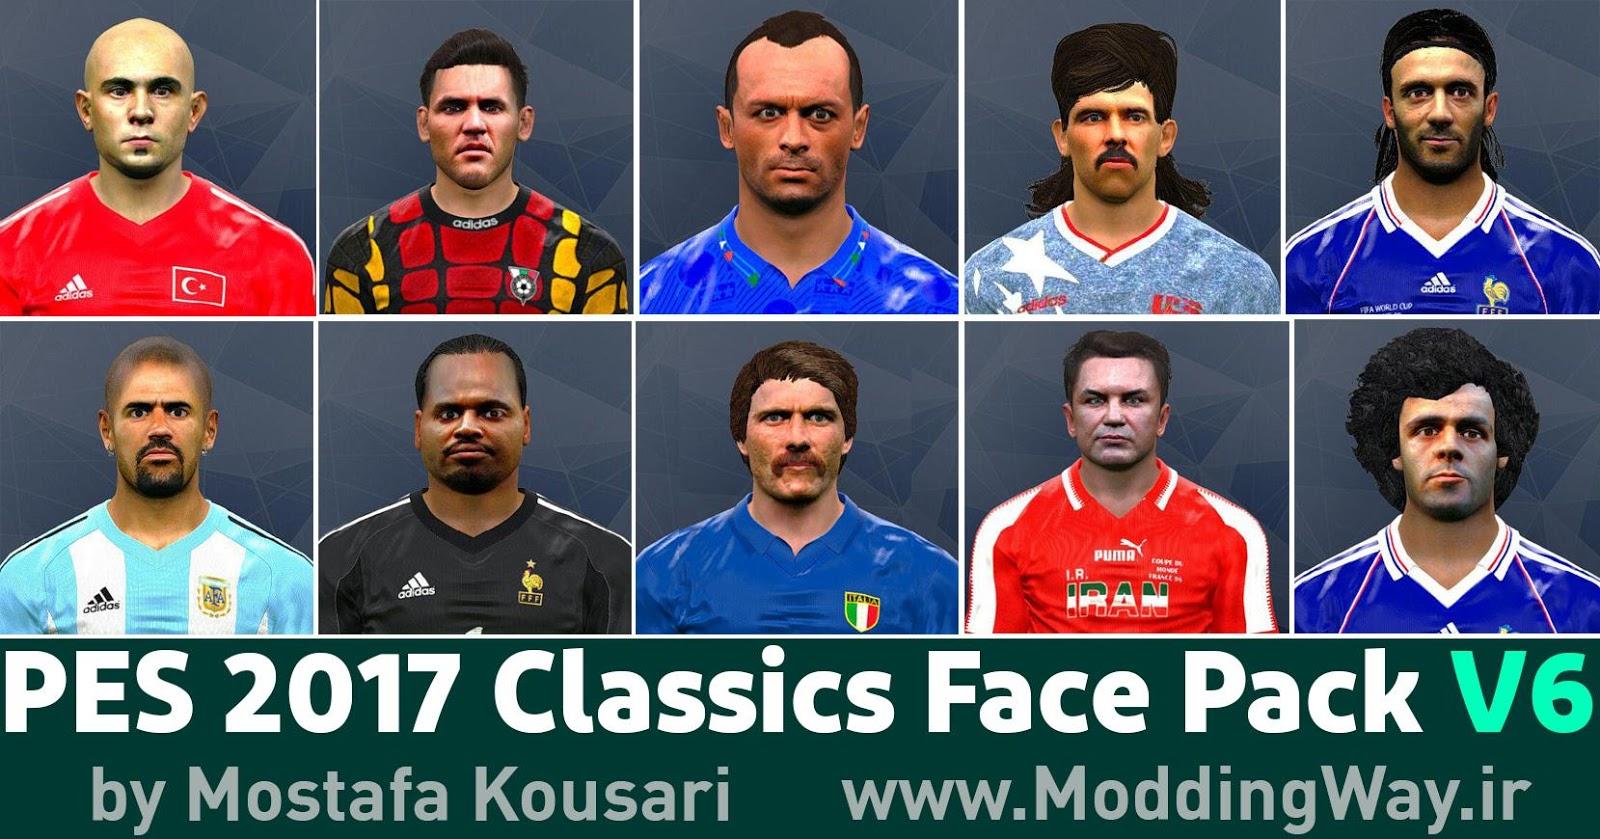 PES 2017 Classics FacePack V6 by Mostafa Kousari